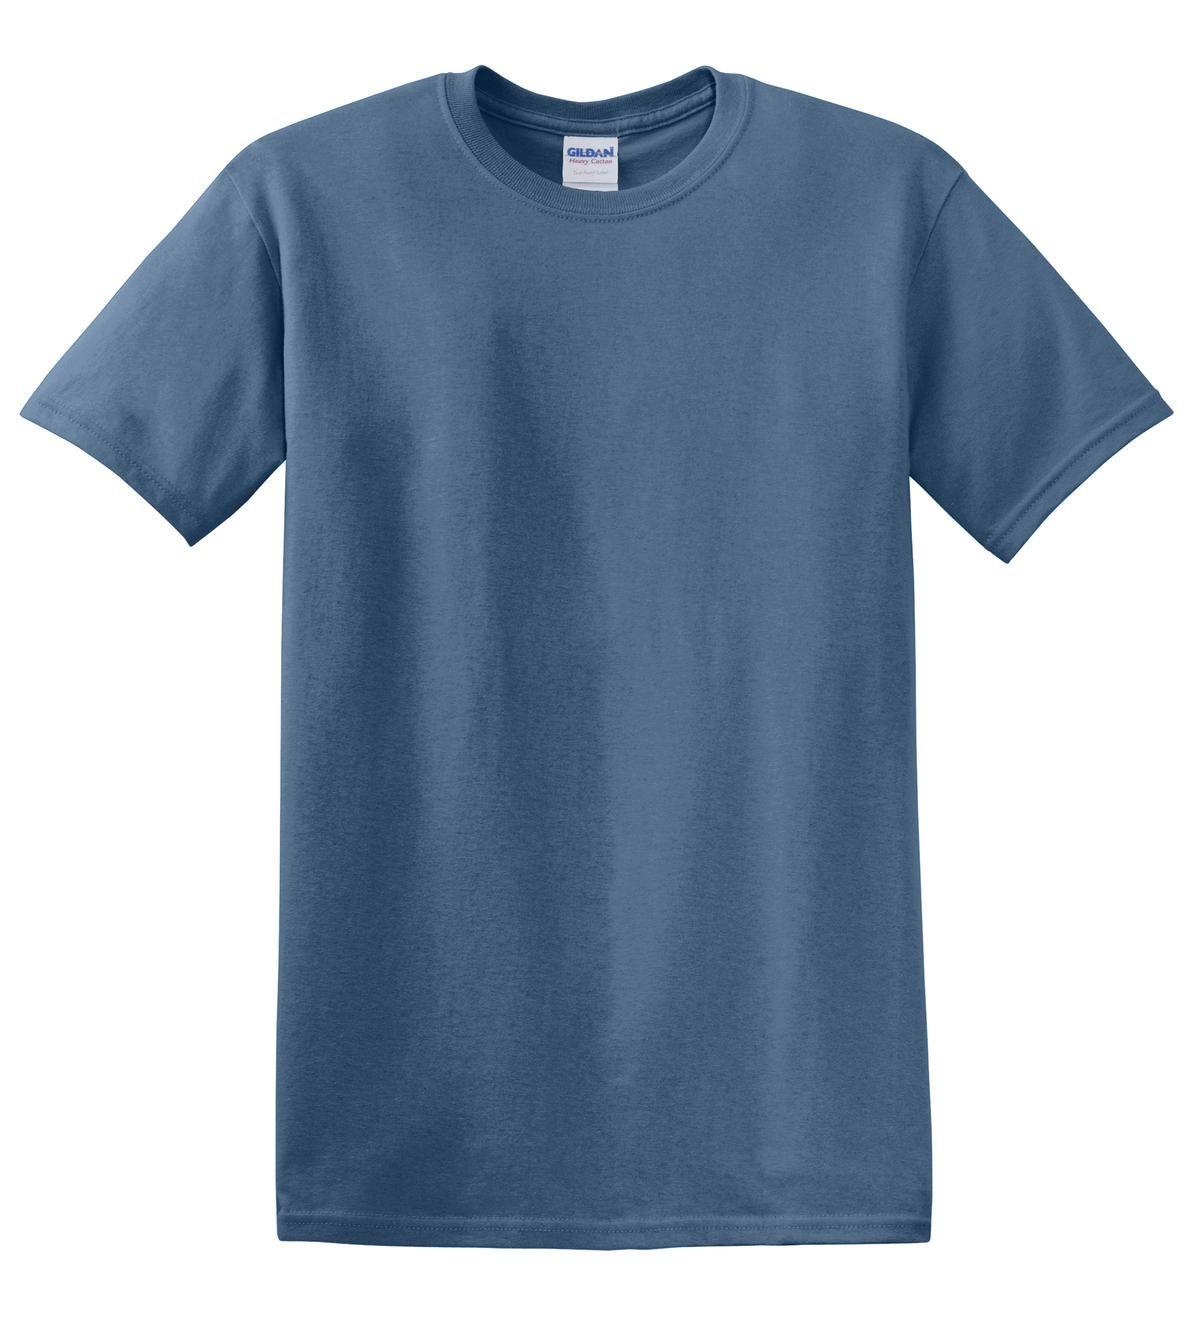 Download Gildan Gildan New Iwpf Men Heavy Cotton T Shirt Walmart Com Blank T Shirts Shirts Custom Clothes